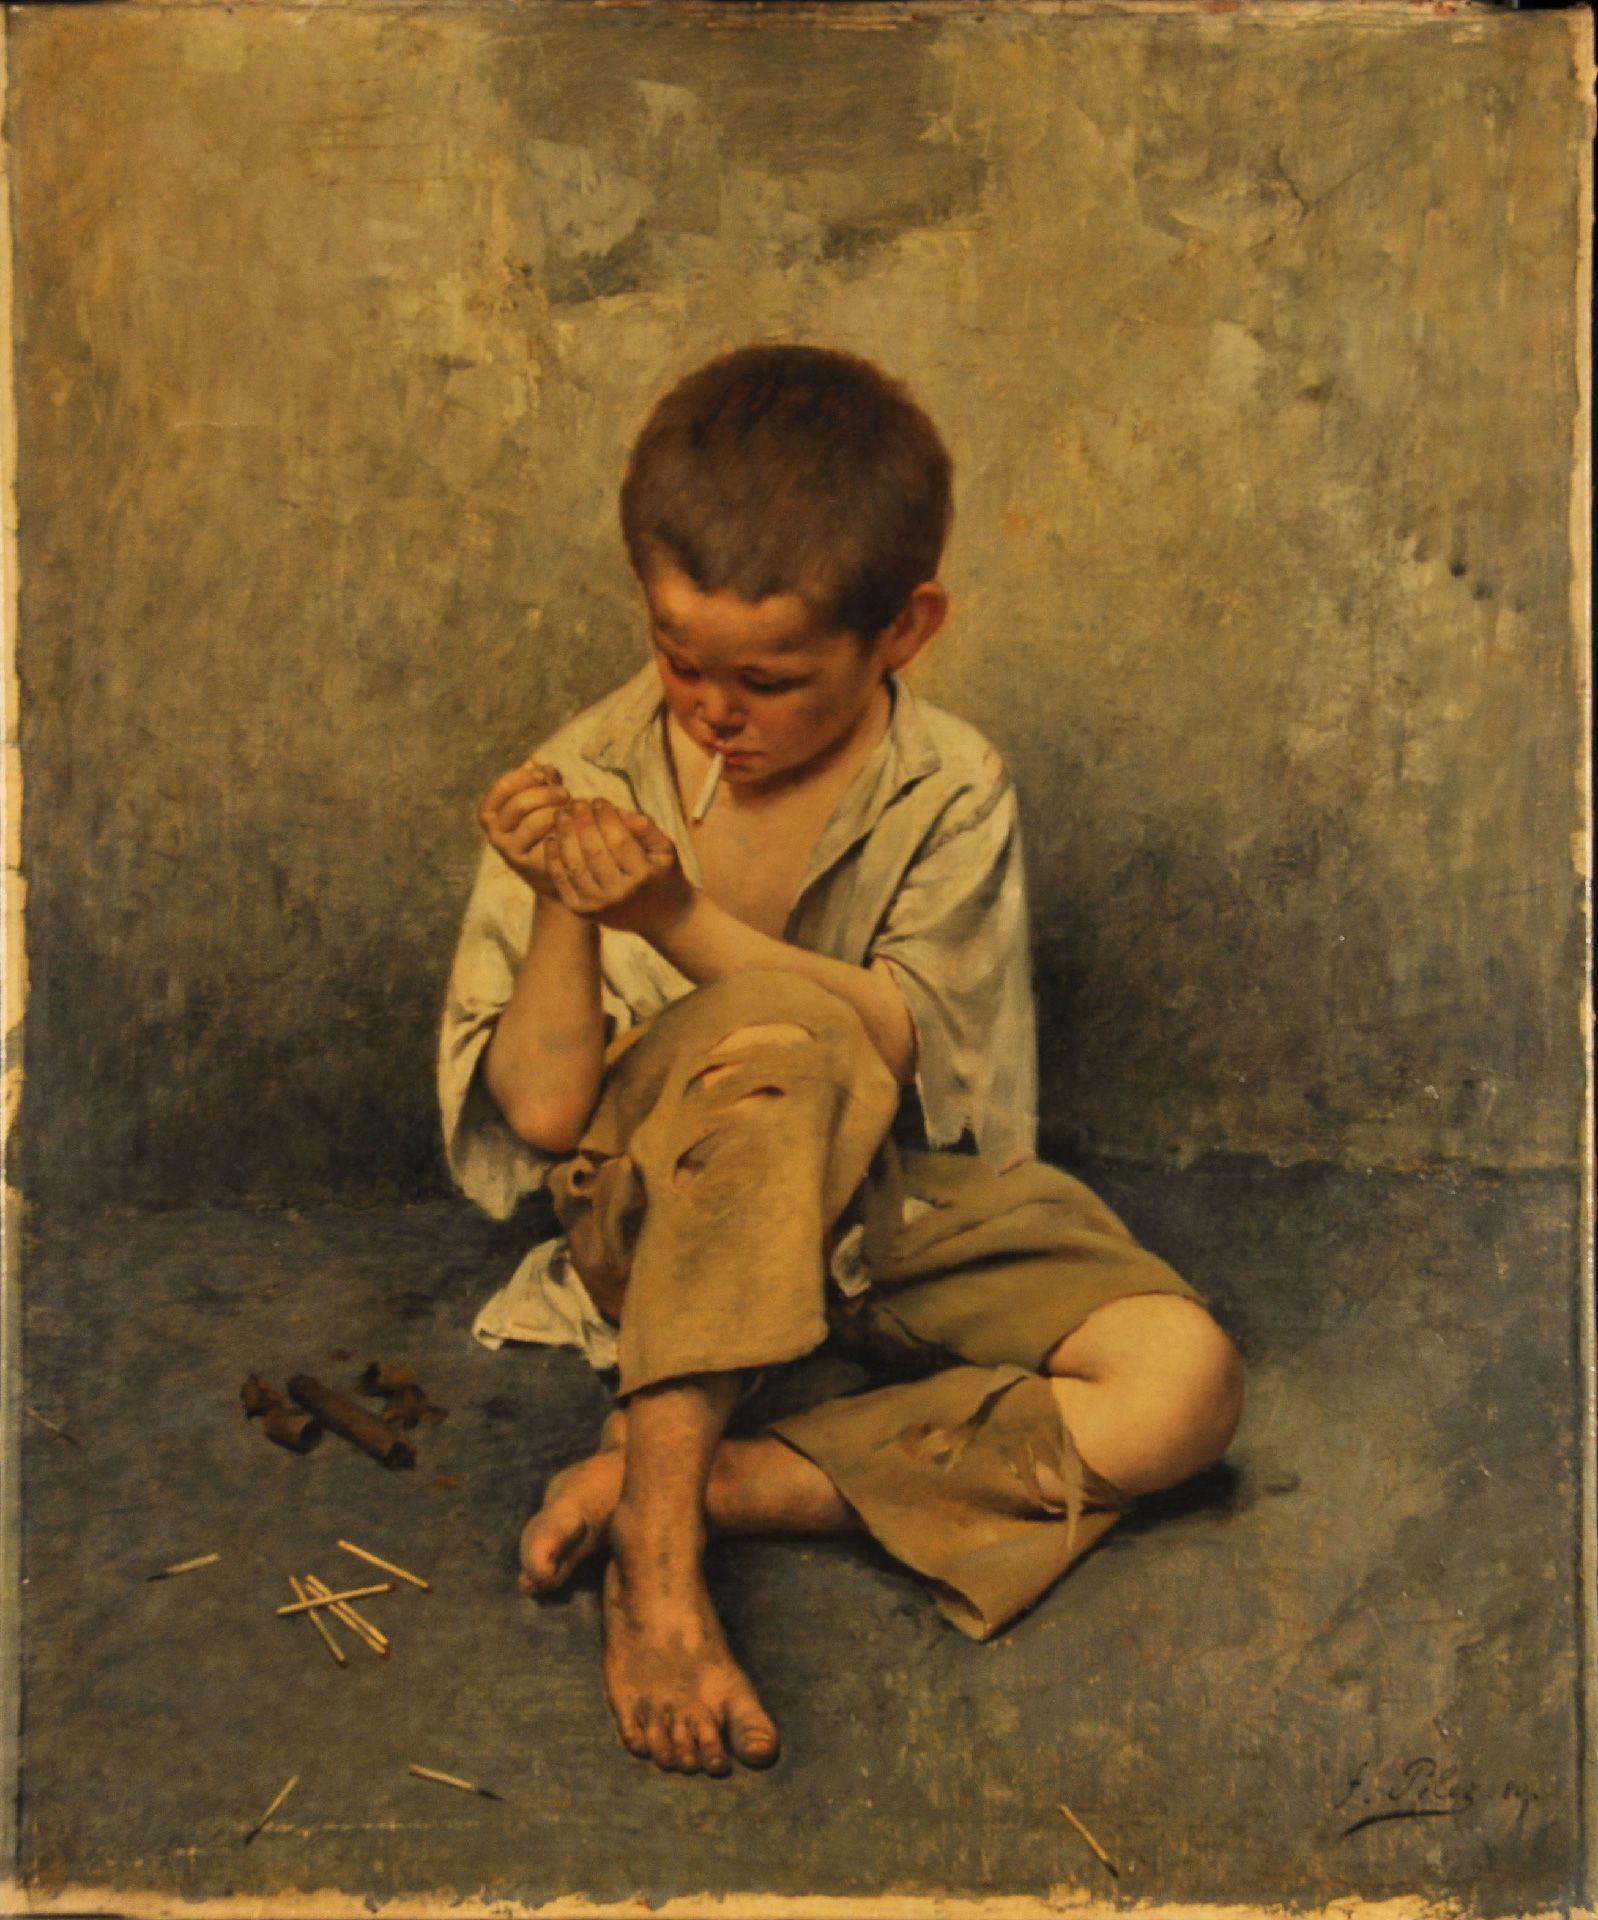 Fernand Pelez, *Street Child*, 1880, oil on canvas, 95.3 x 79.1 cm. MMFA, William F. Angus Bequest